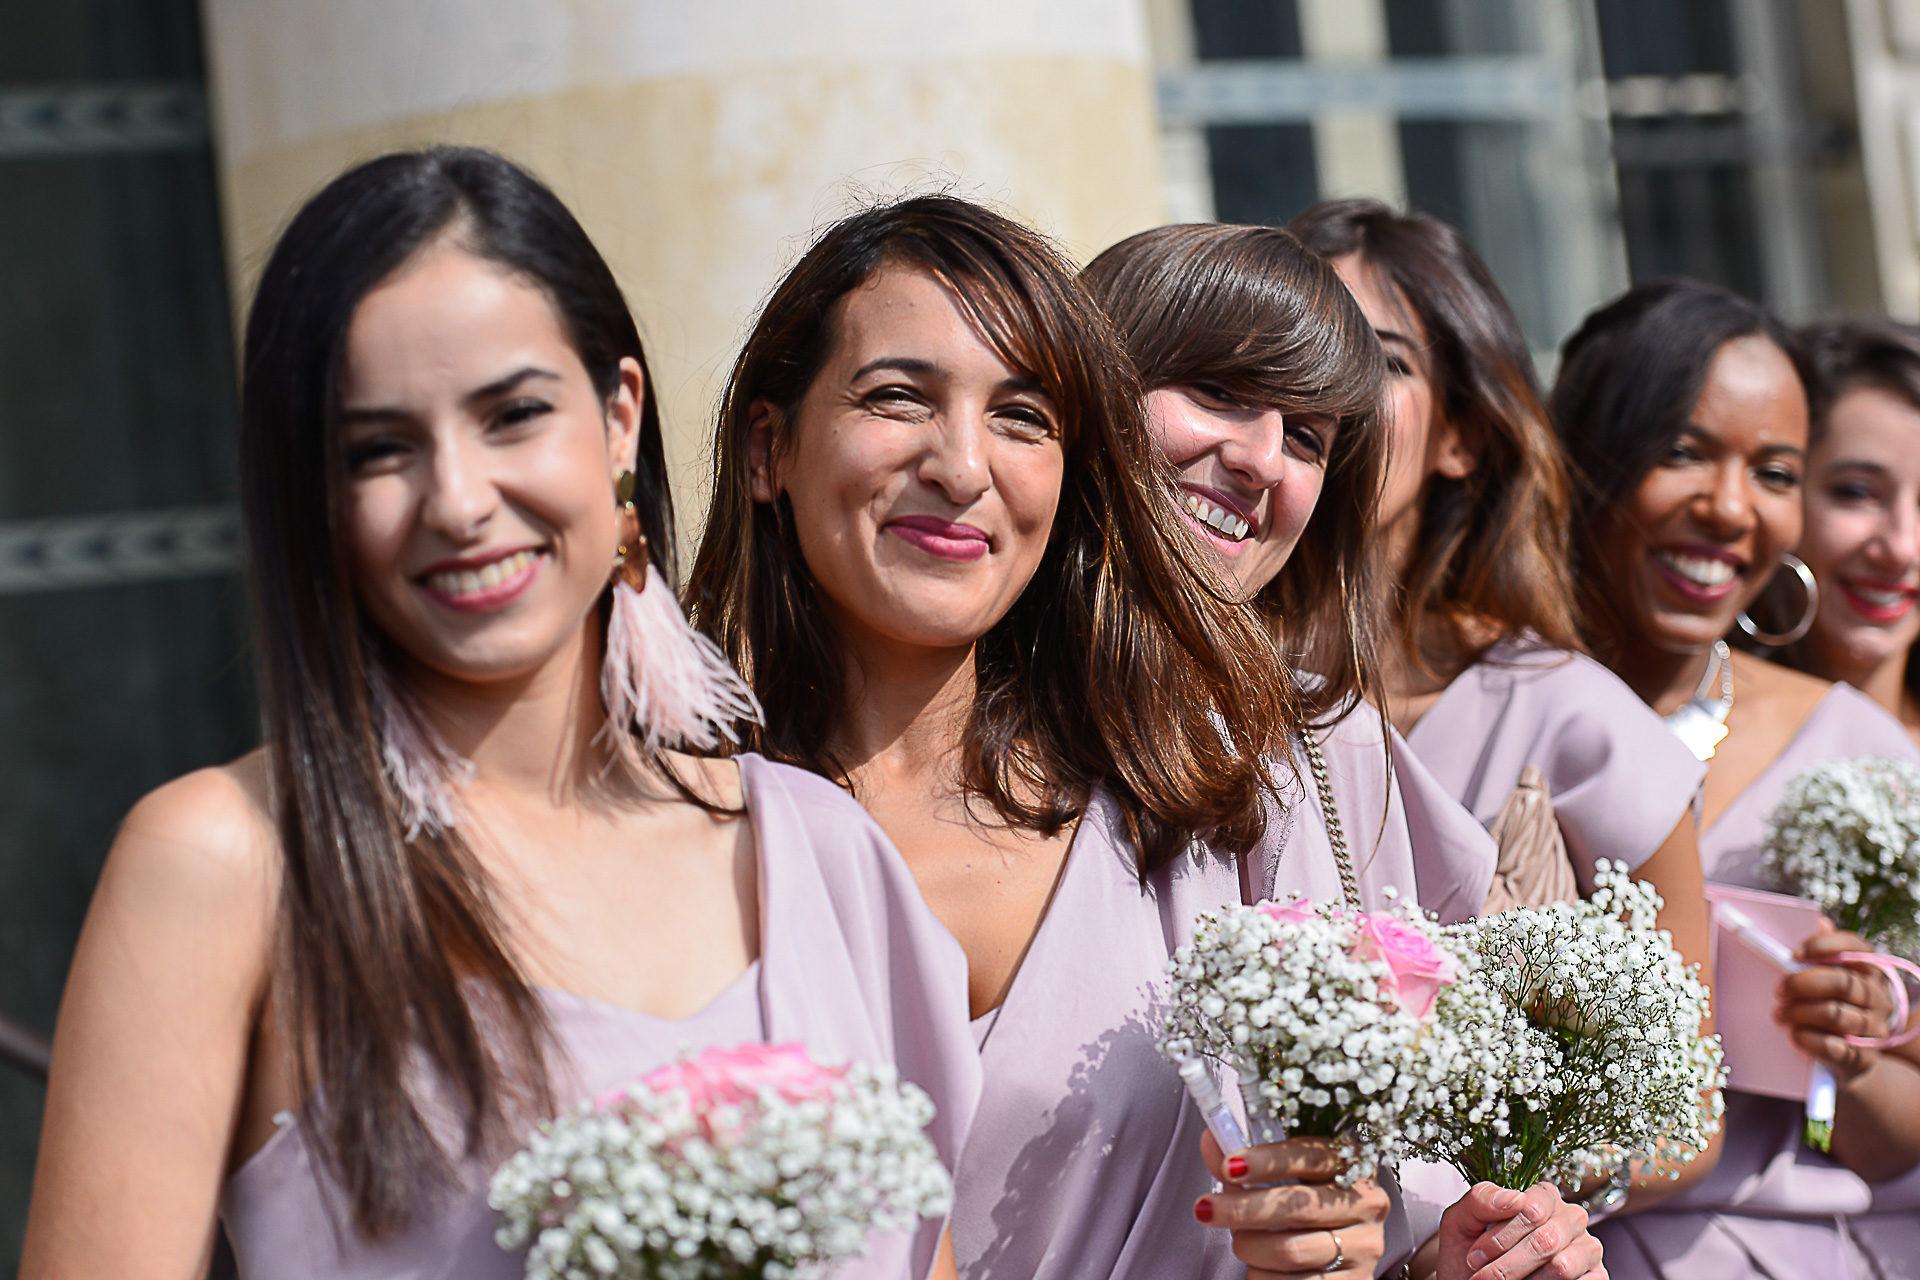 photographe-mariage-paris-demoiselles-honneur-mairie